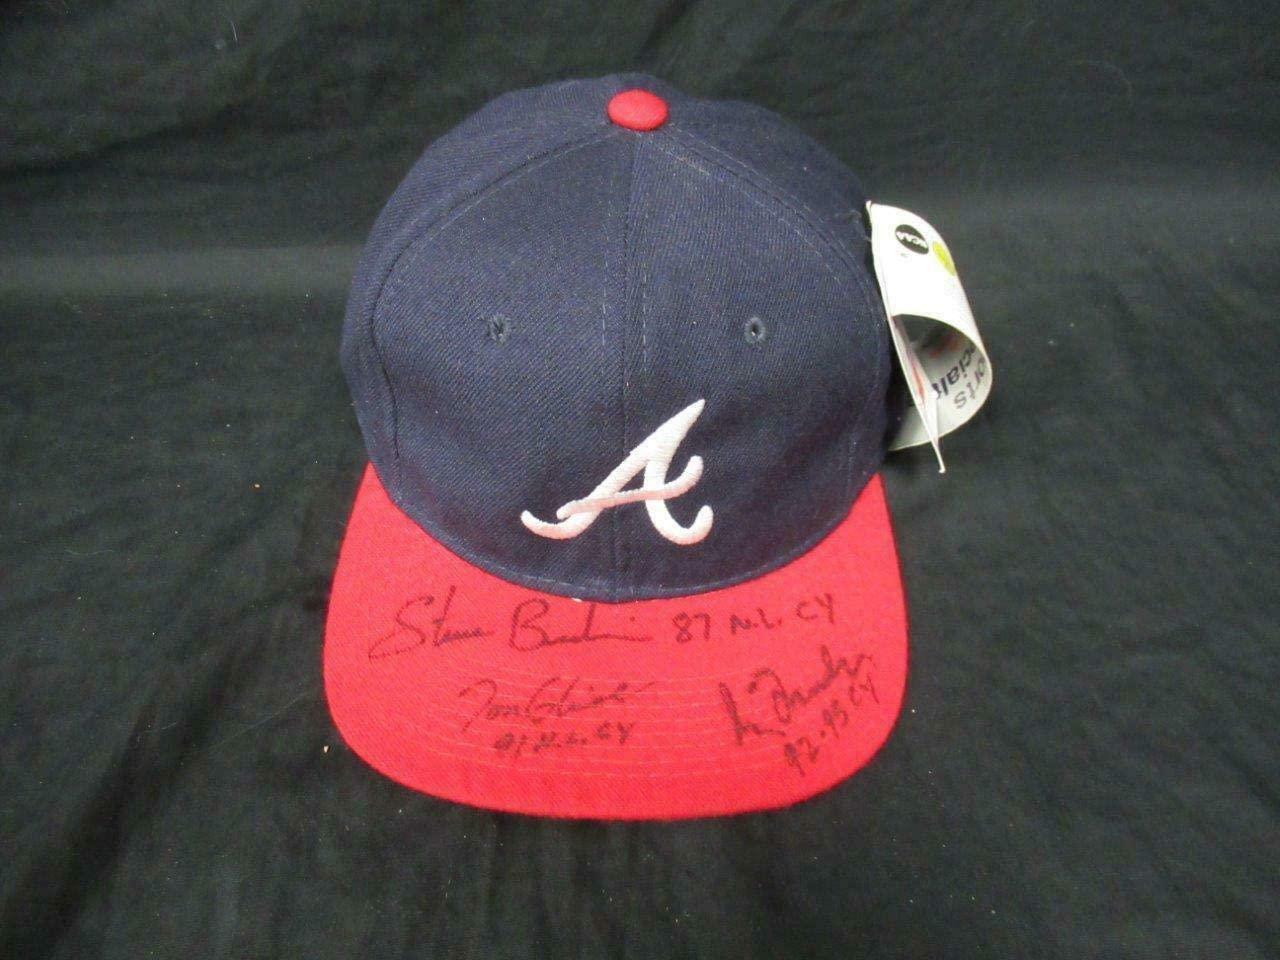 Glavine Maddux Bedrosian Multi-Signed Atlanta Braves Hat Auto AG00937 - PSA/DNA Certified - Autographed Hats